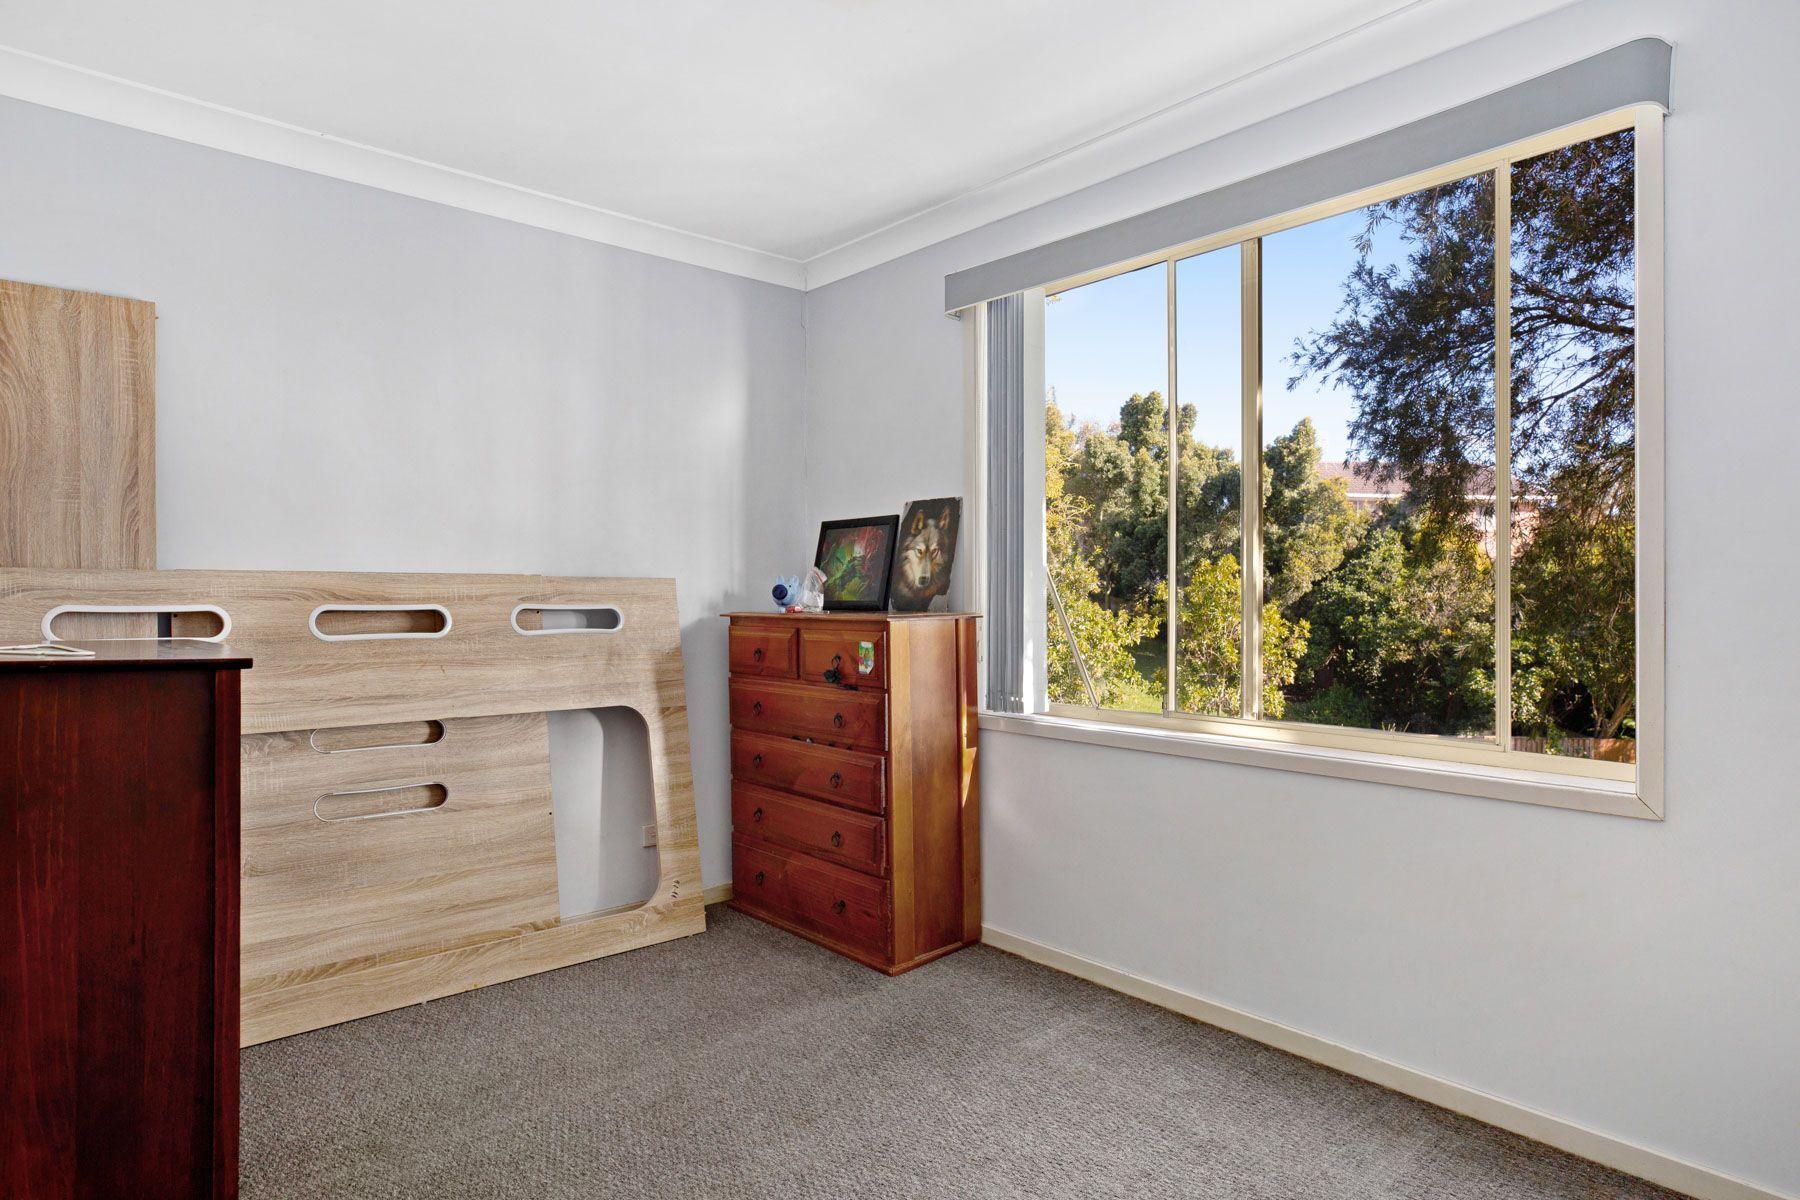 3 Natalie Close, Tenambit, NSW 2323